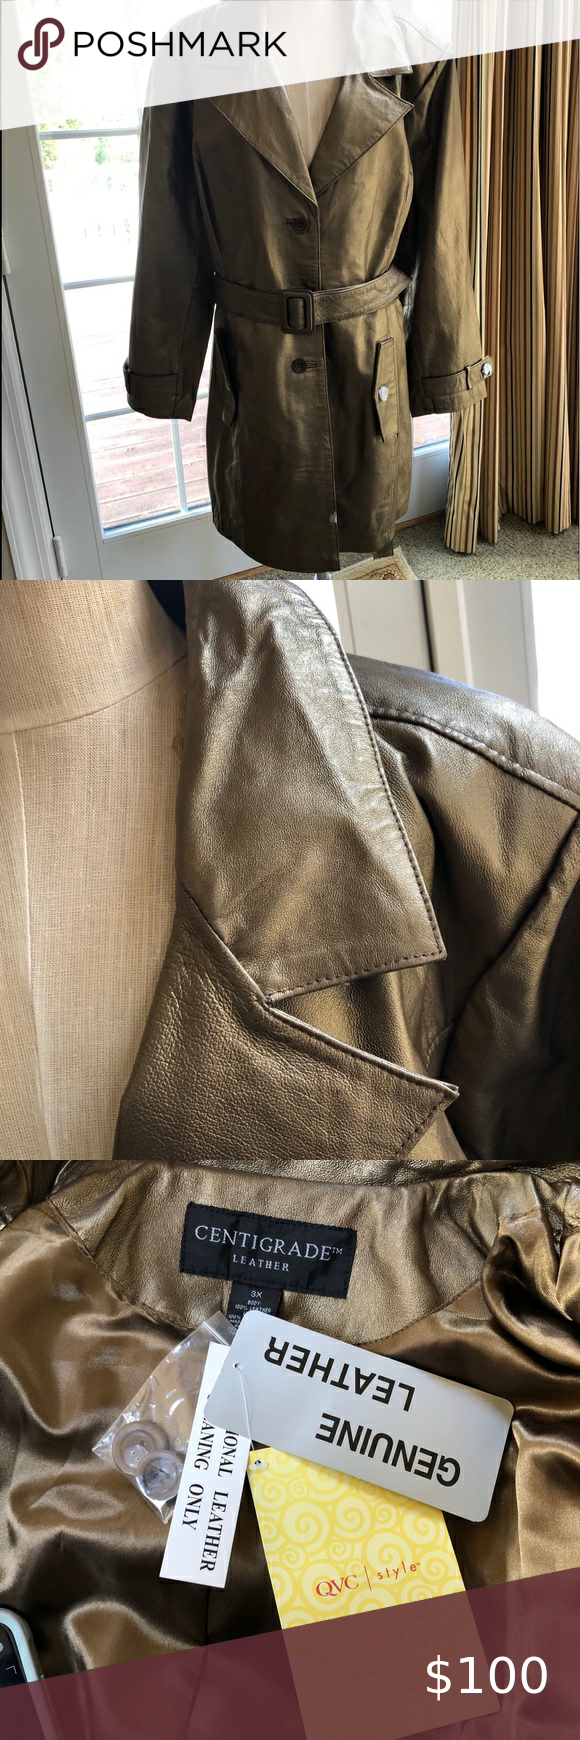 Centigrade Leather Trenchcoat Vintage Leather Jacket Embroidered Leather Jacket Burgundy Leather Jacket [ 1740 x 580 Pixel ]